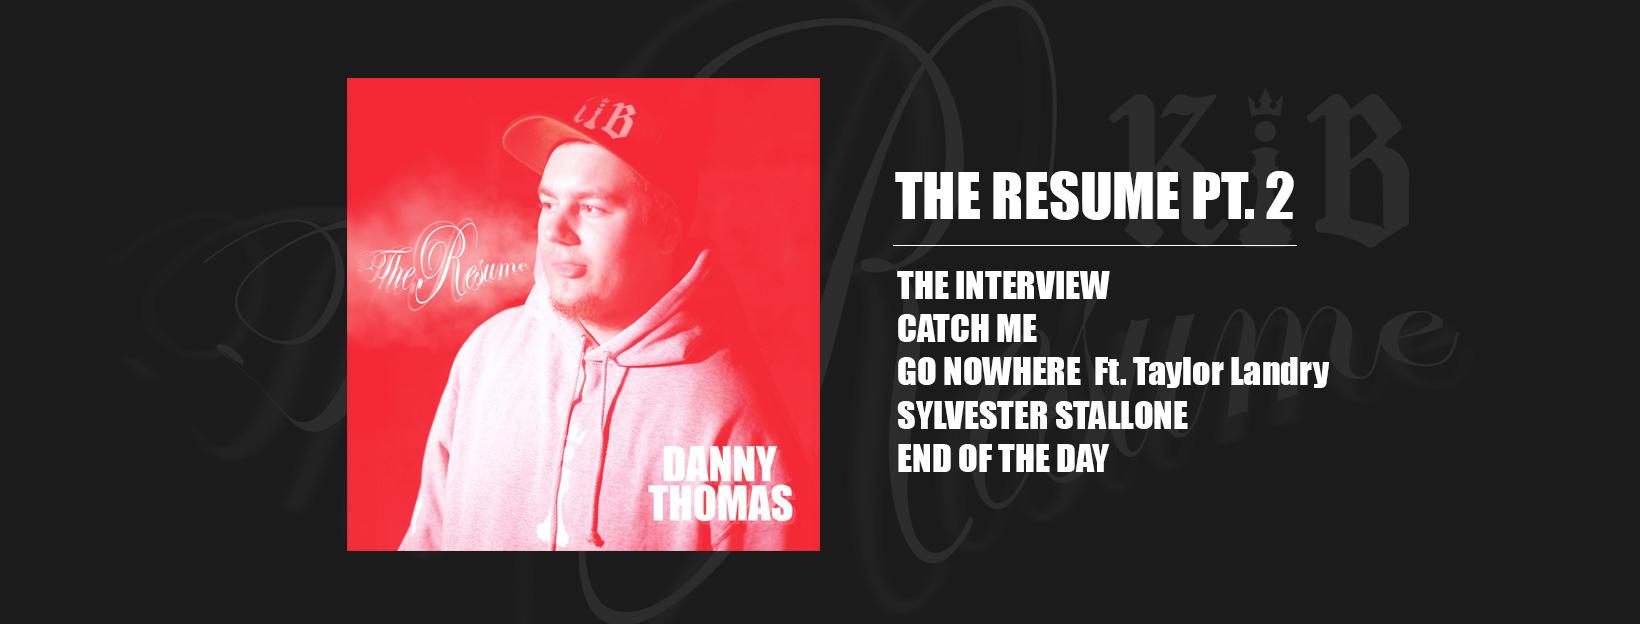 Danny-Thomas-The-Resume_part-2-fb.jpg